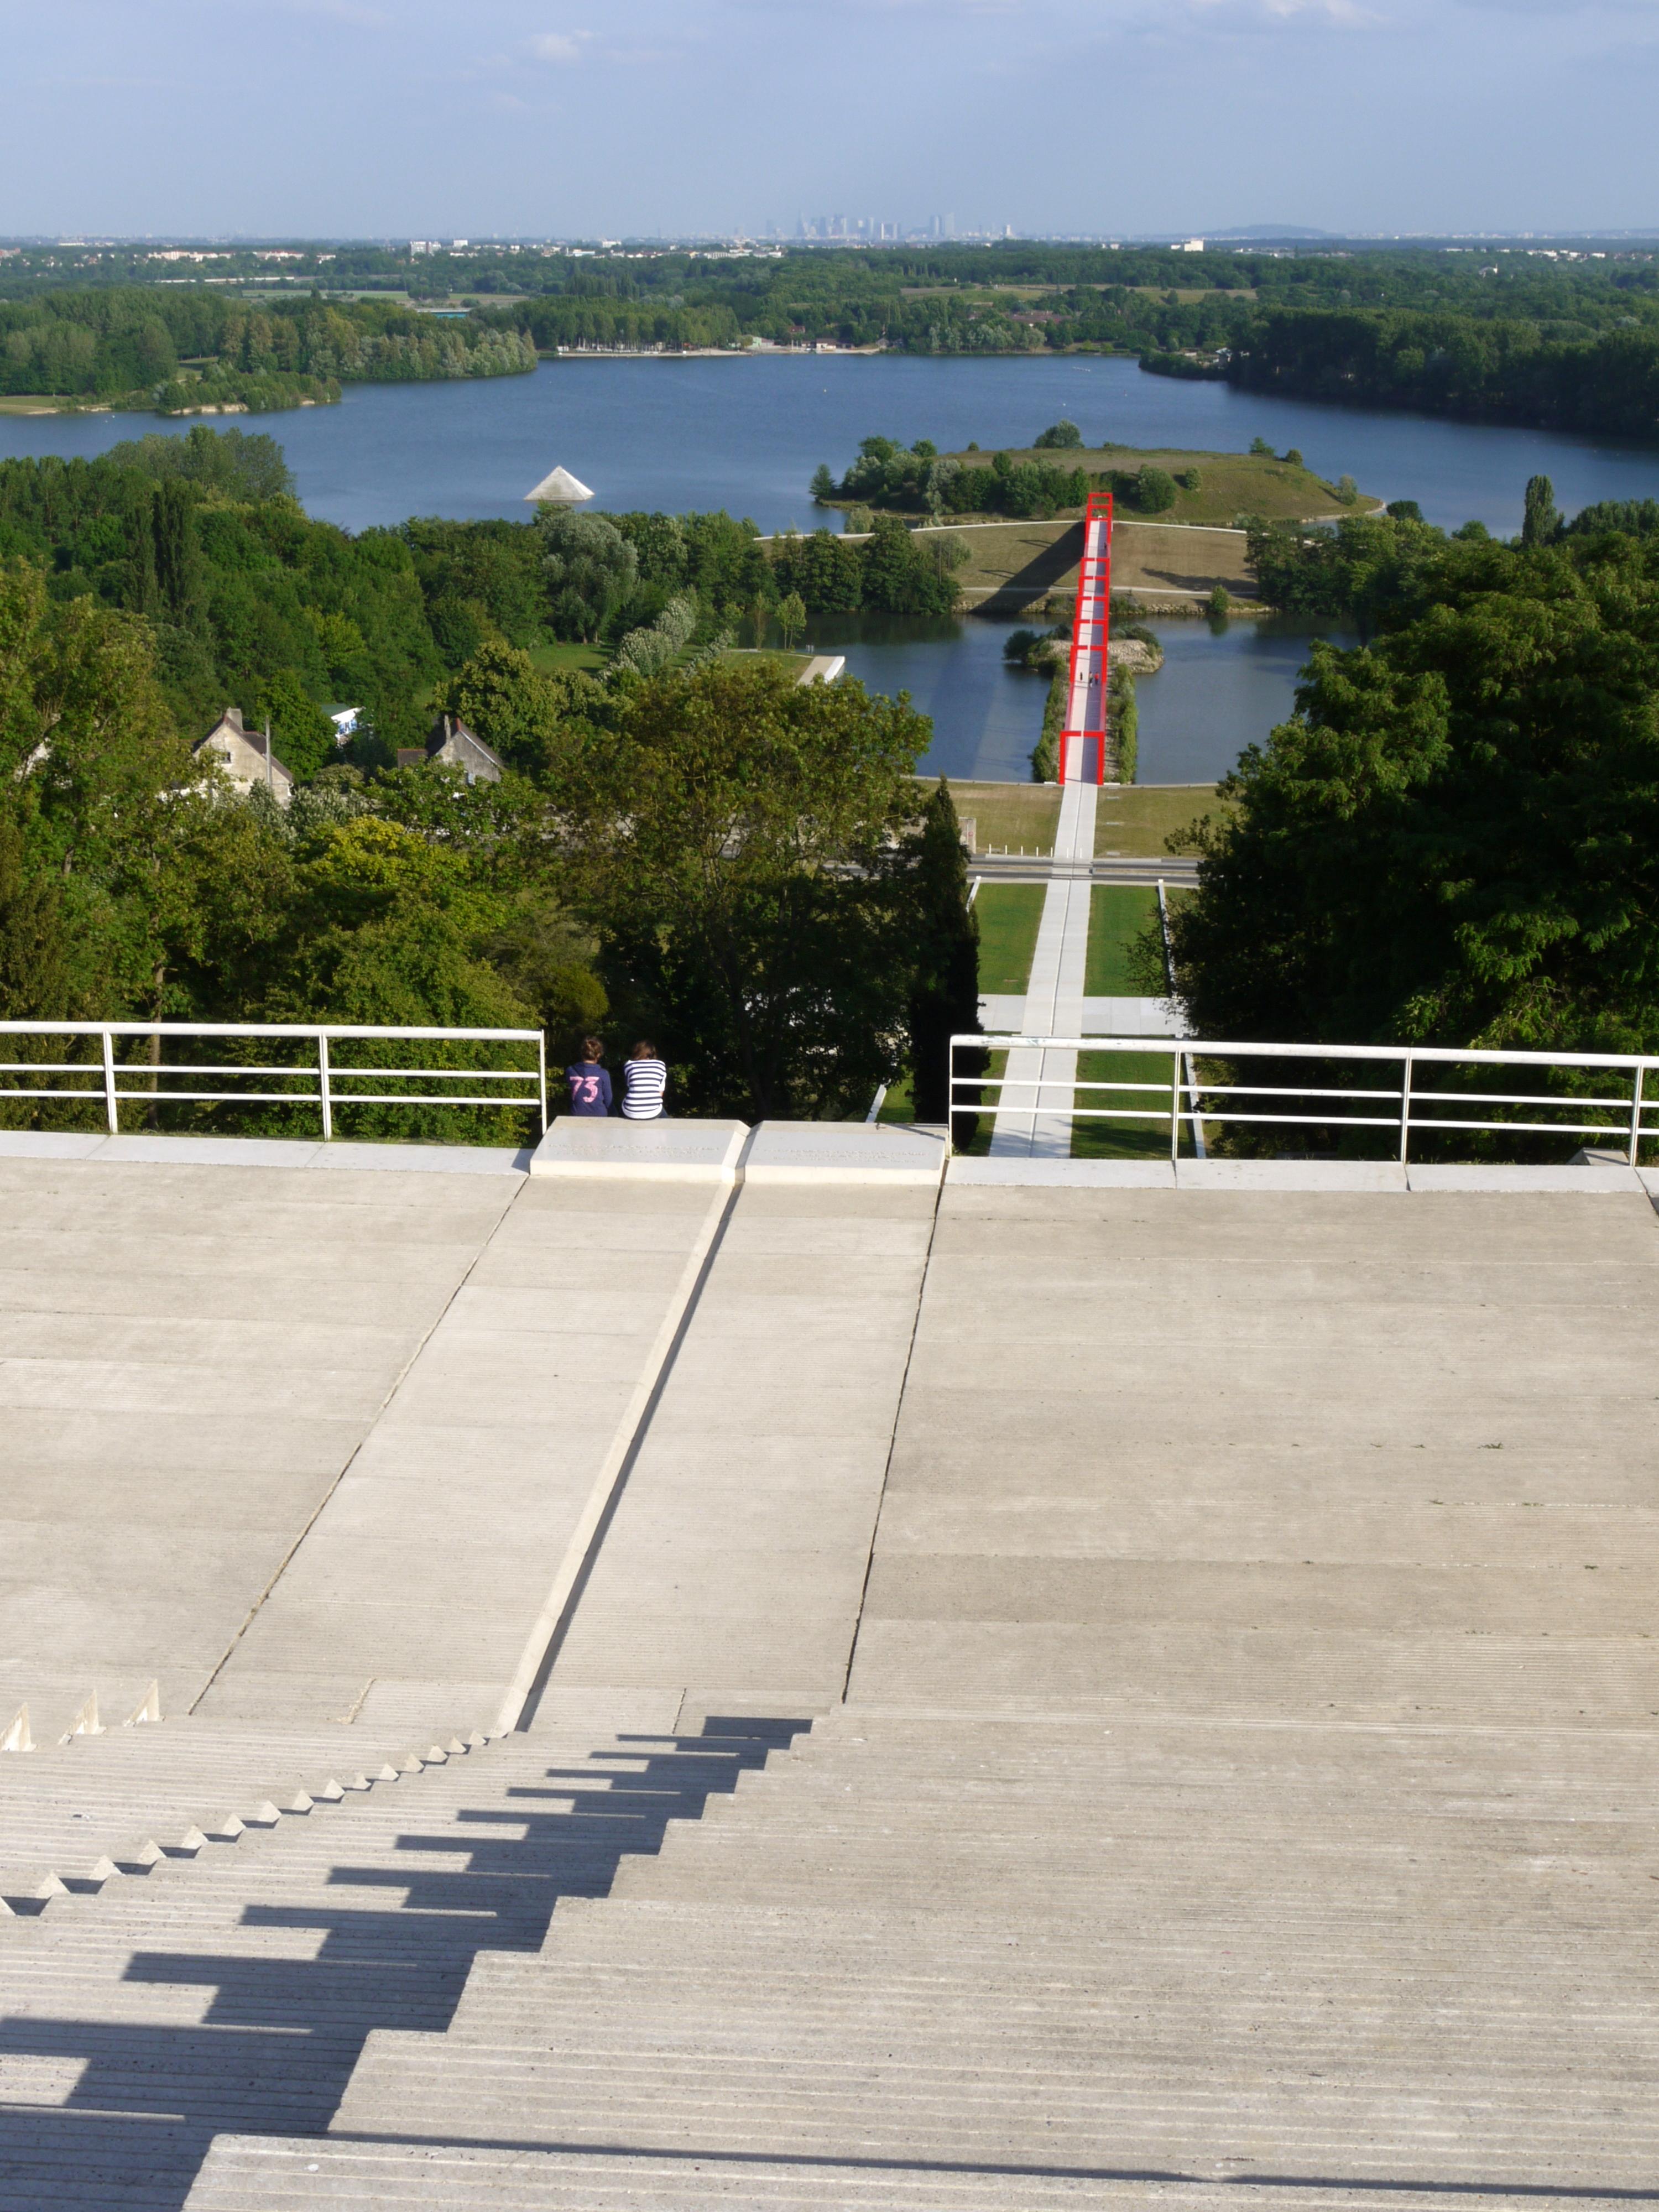 Escalier Val D Oise axe majeur — wikipédia